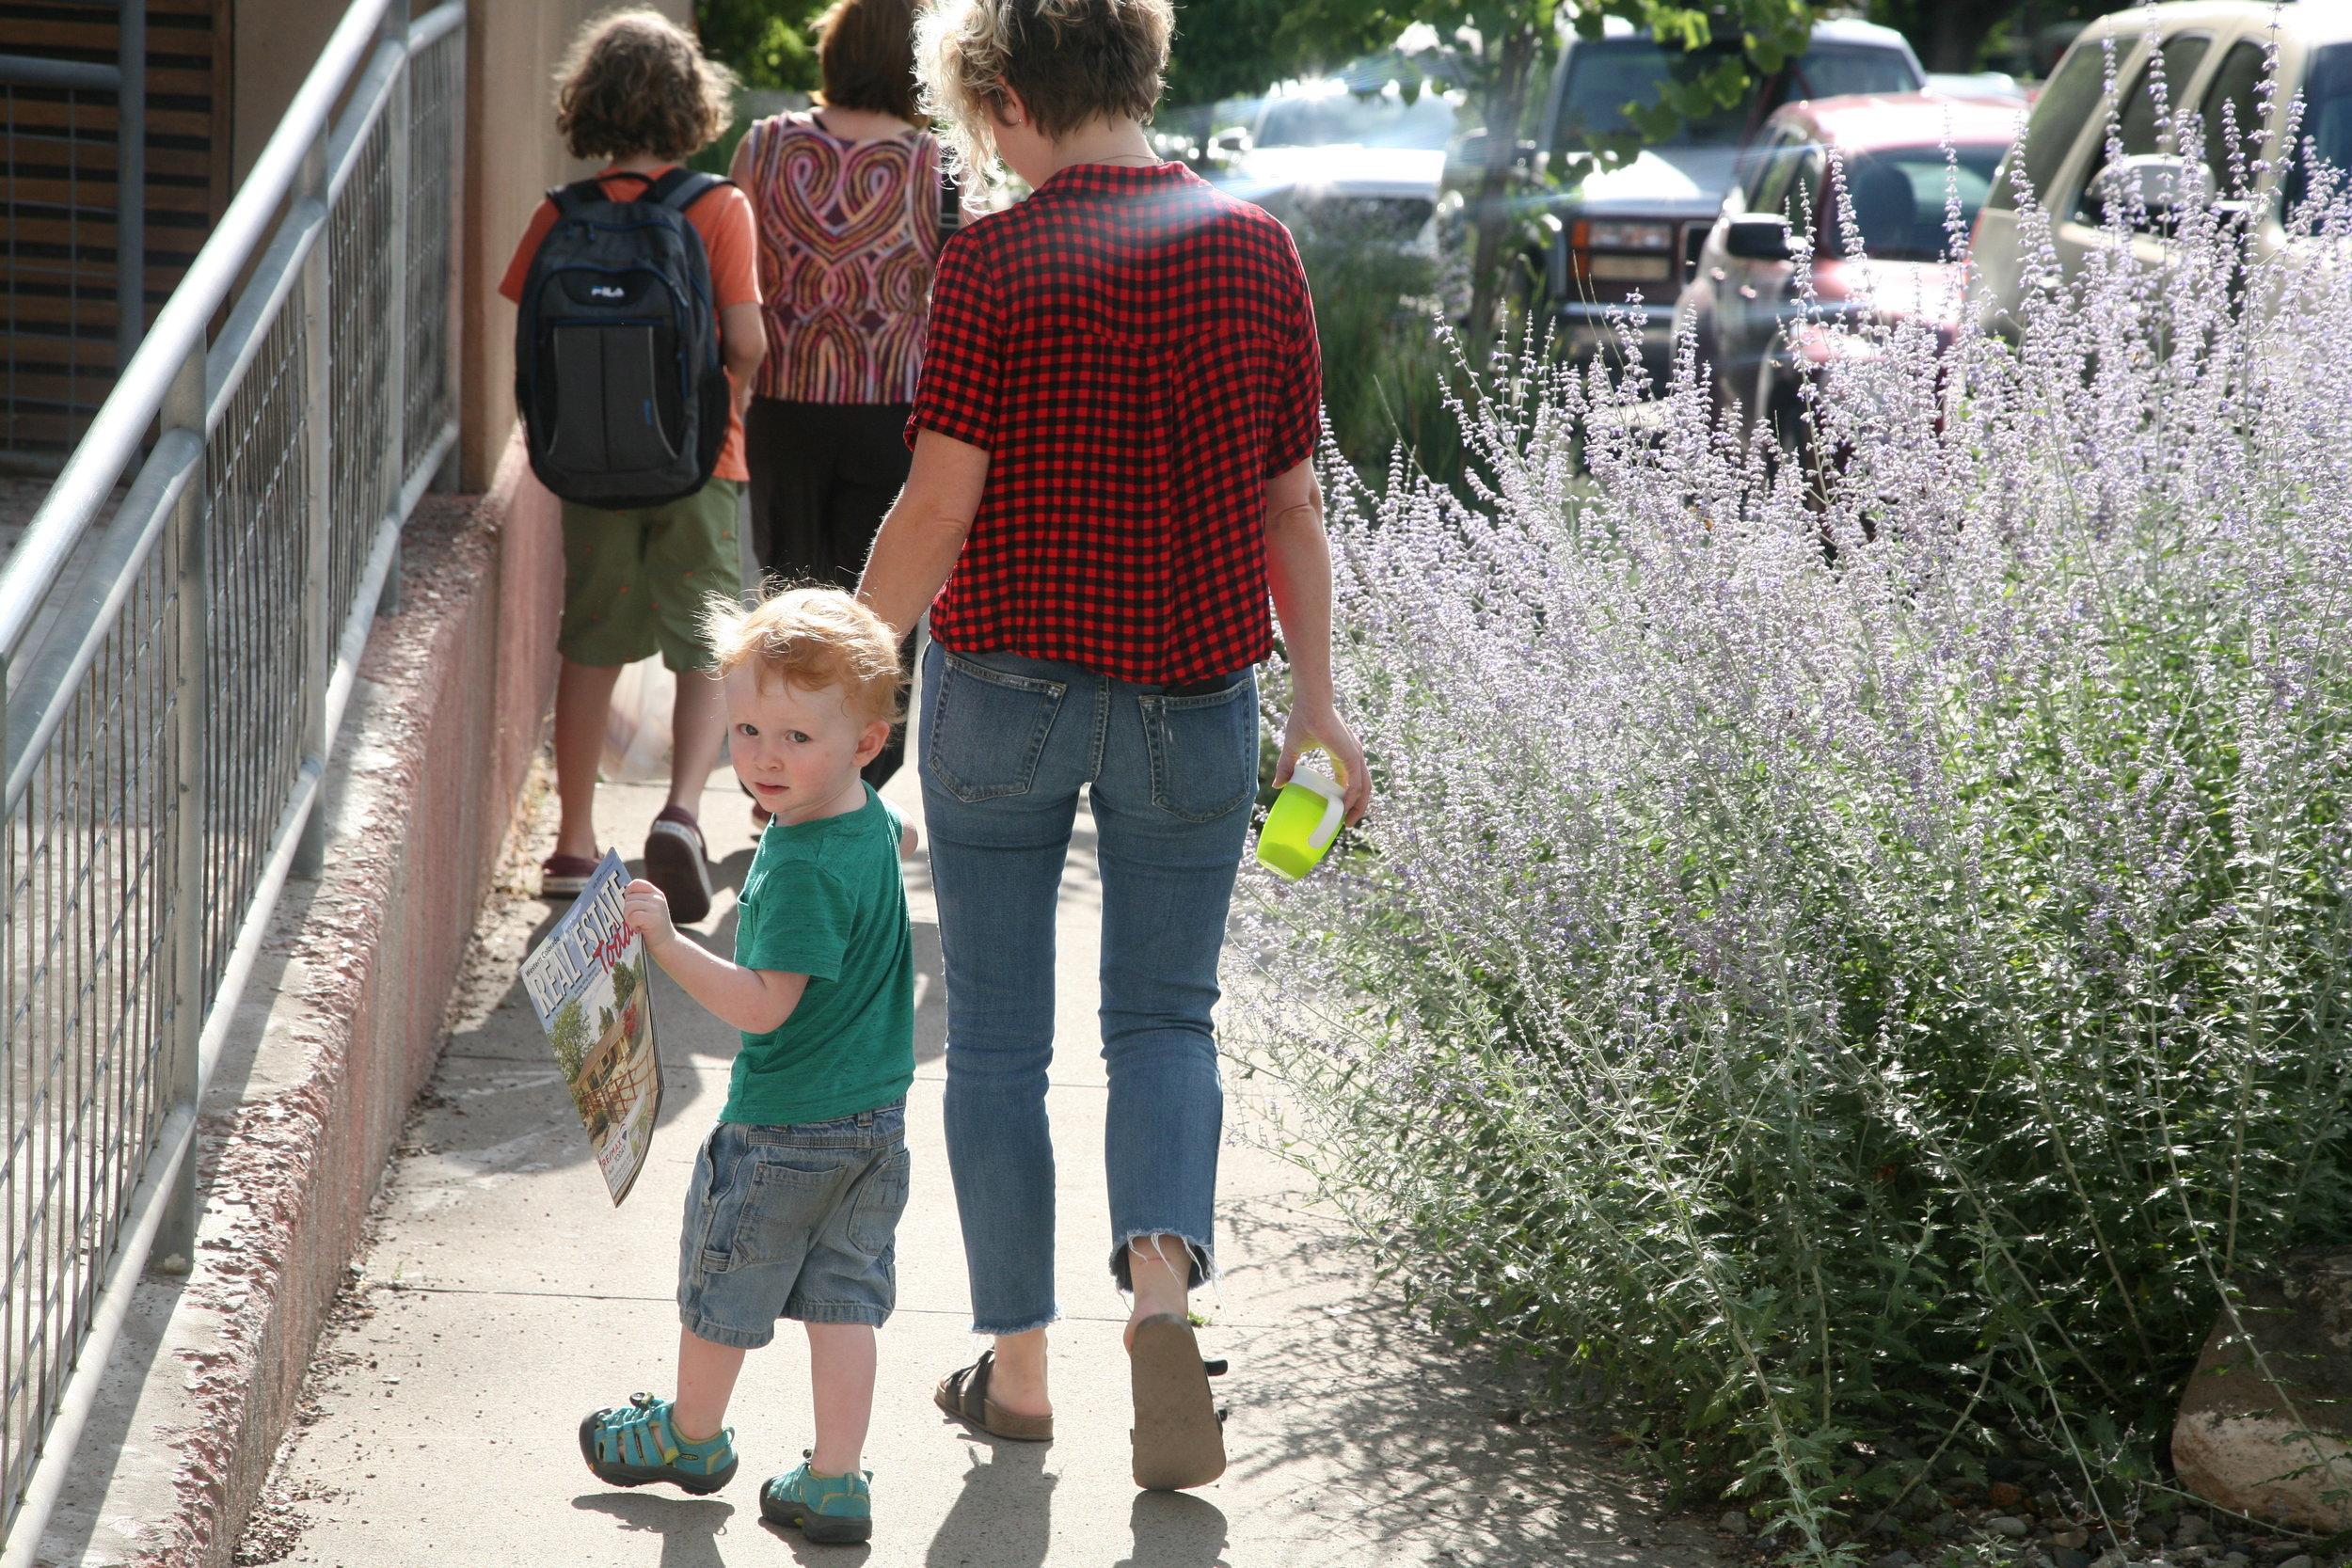 Brigid's son, Sebi, walking with friend and babysitter, Hanna Doreen Brown behind Resident Maria Velasco and son Alex.